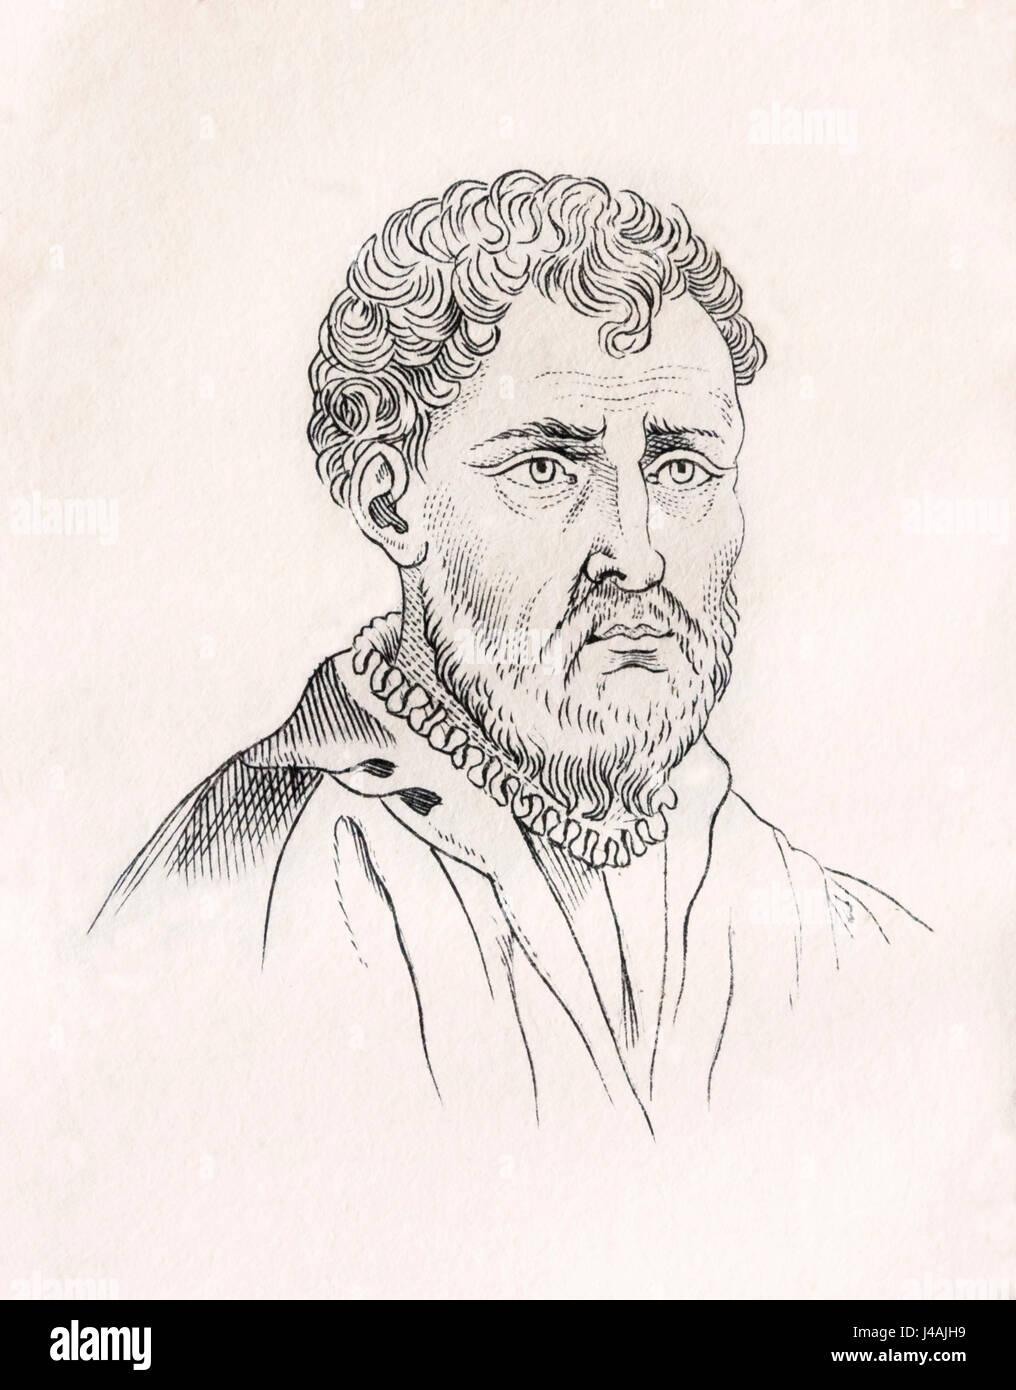 Battista Franco Veneziano aka Giovanni Battista Franco,  il Semolei or Battista Franco, before 1510 – 1561. Italian - Stock Image